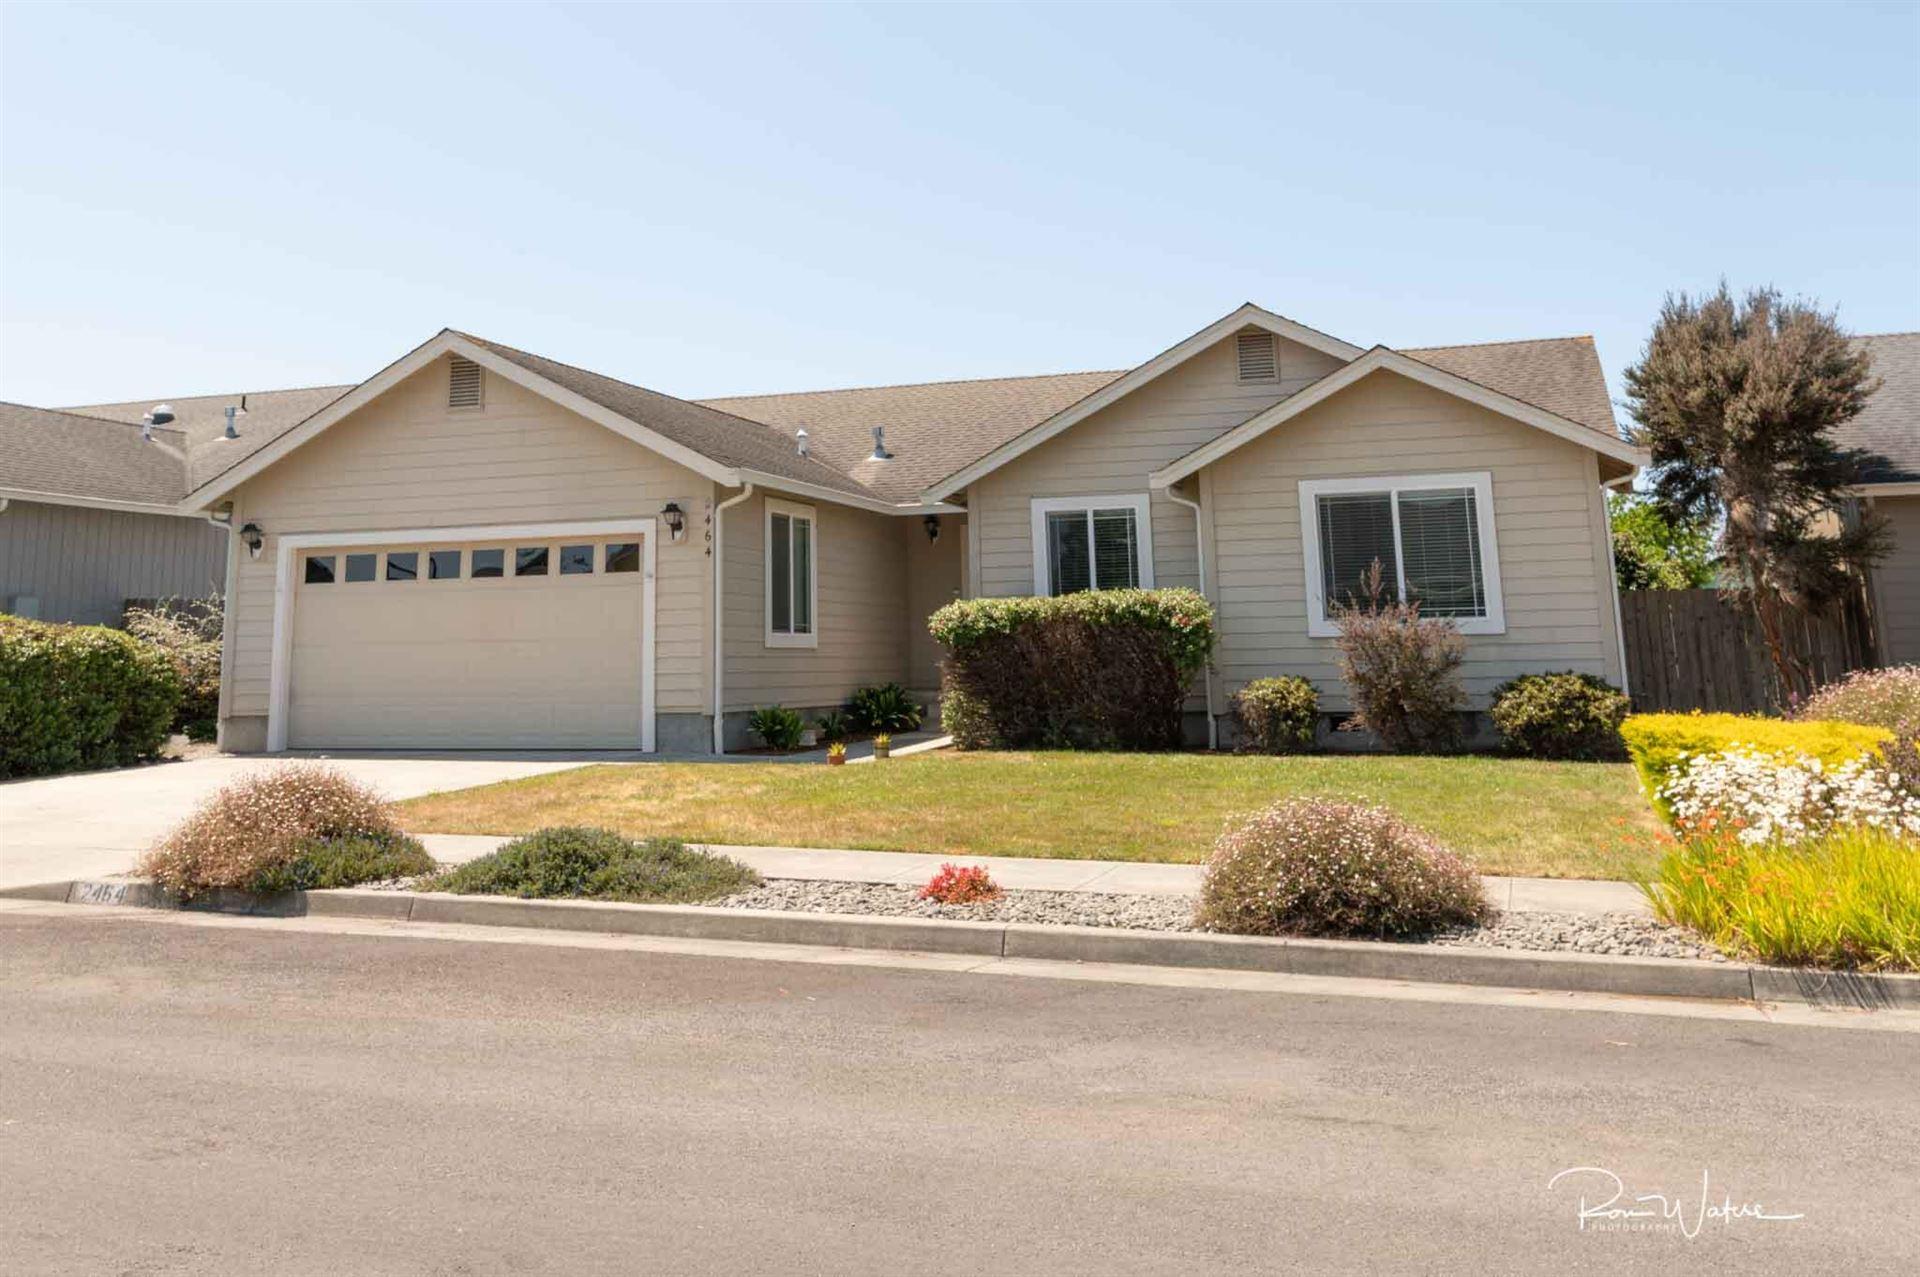 2464 Hawks View Court, McKinleyville, CA 95519 - MLS#: 259655